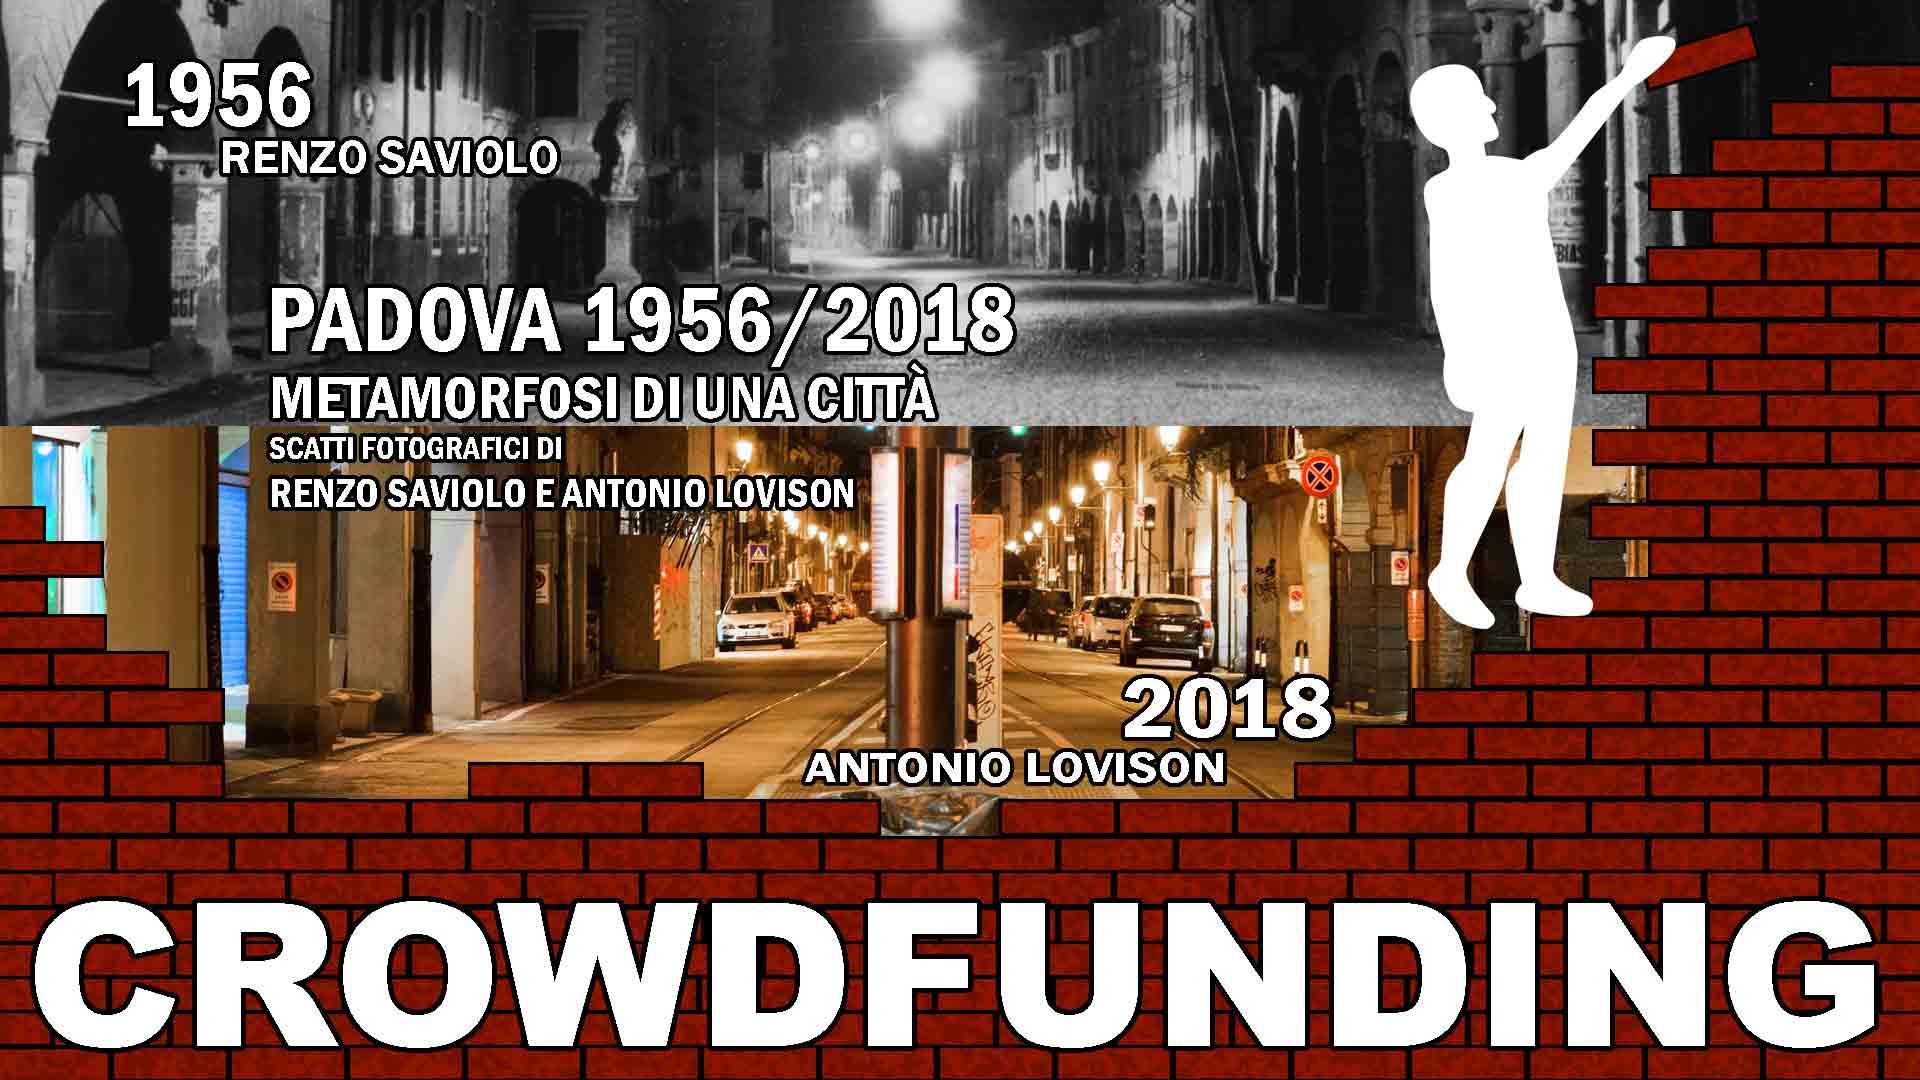 Crowdfunding - Padova 1956/2018 Metamorfosi di una città